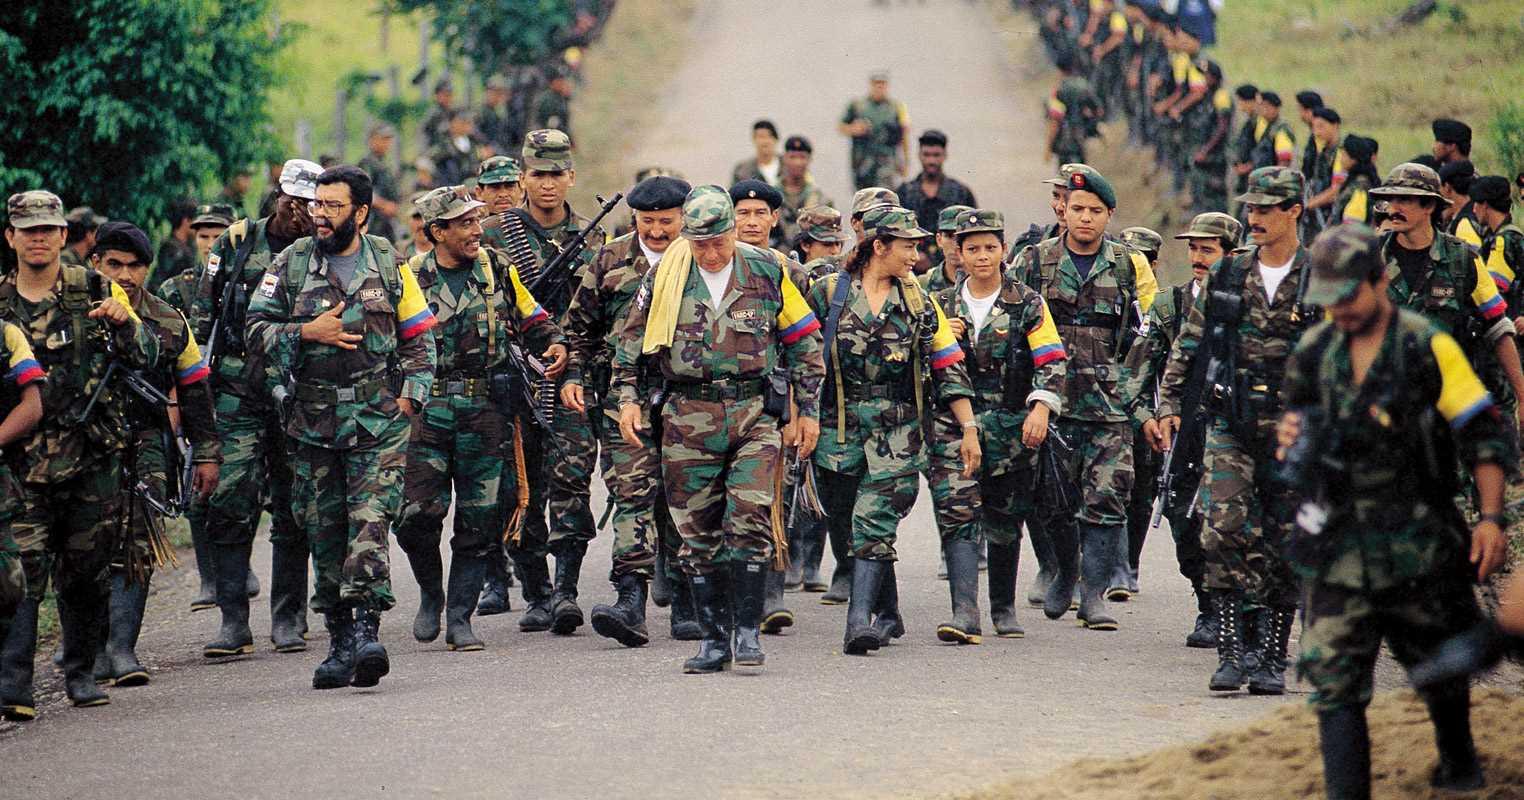 guerrilleros-paz-colombia-ivan-duque-santos-FARC